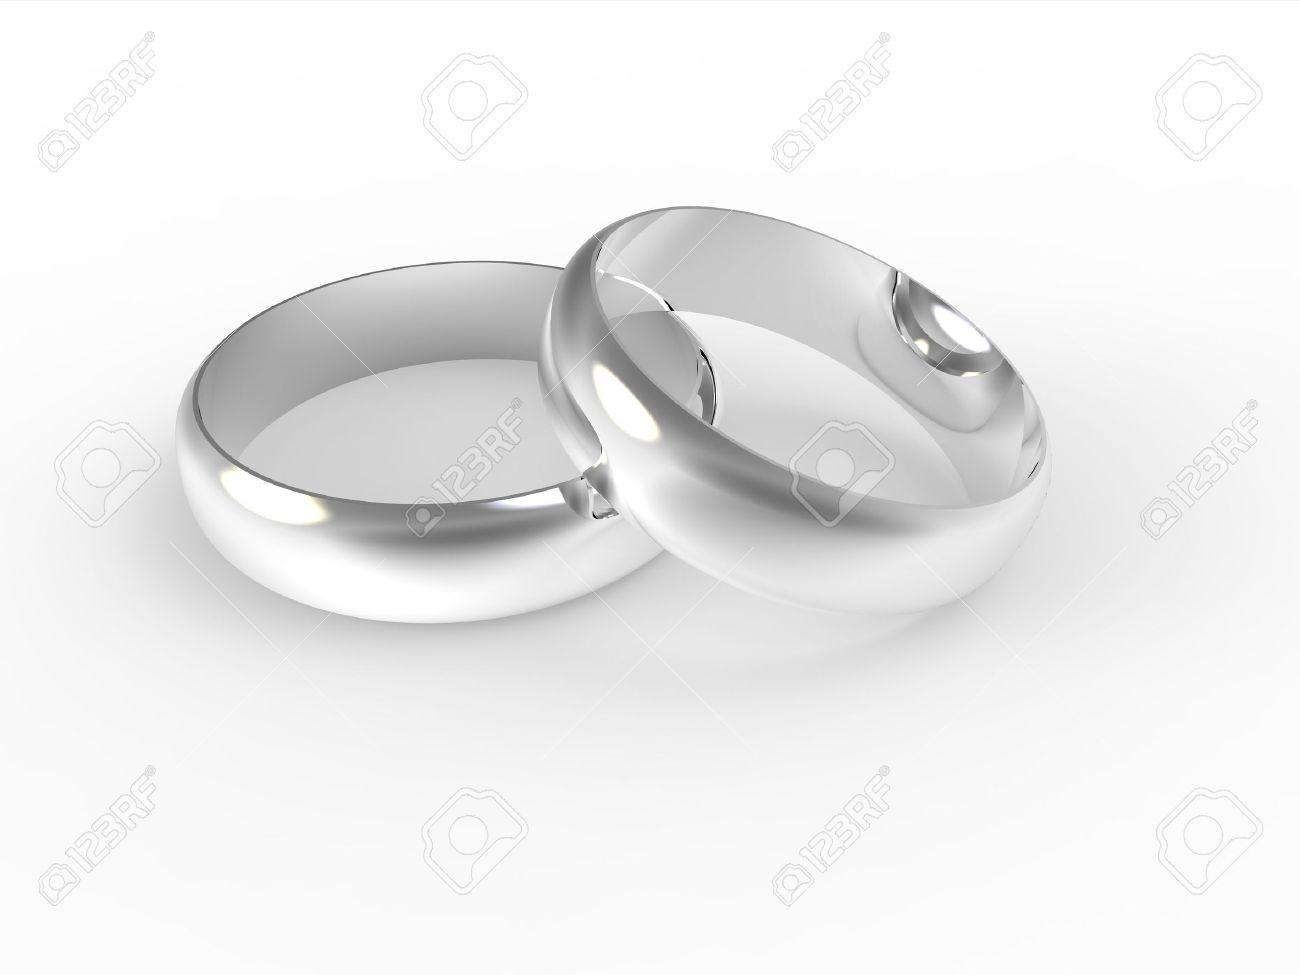 silver wedding ring silver wedding rings silver wedding ring Silver wedding rings isolated on white background